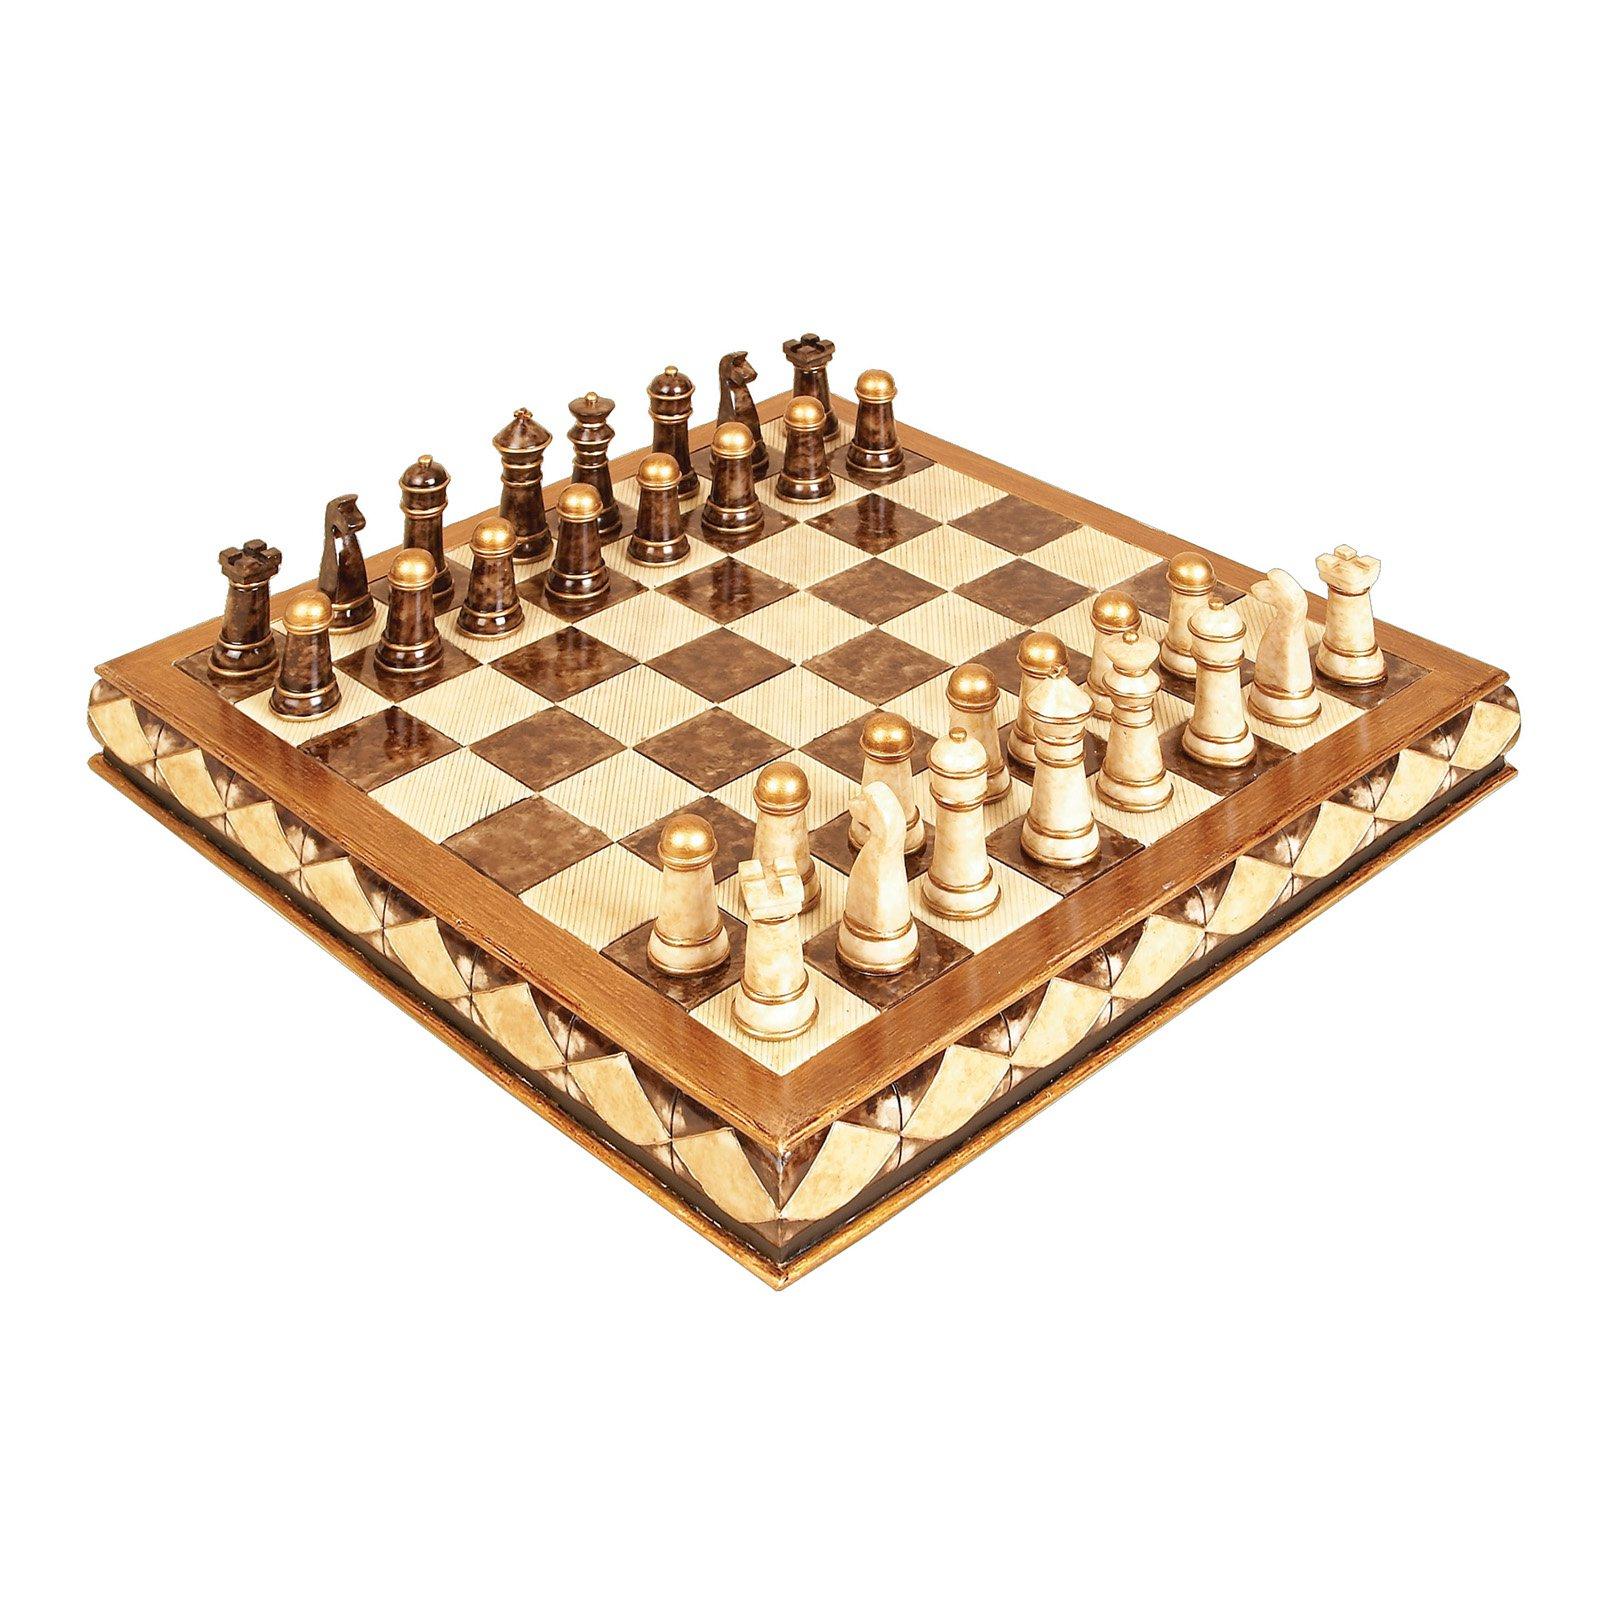 Polystone Chess Set Entertaining Decor by Benzara